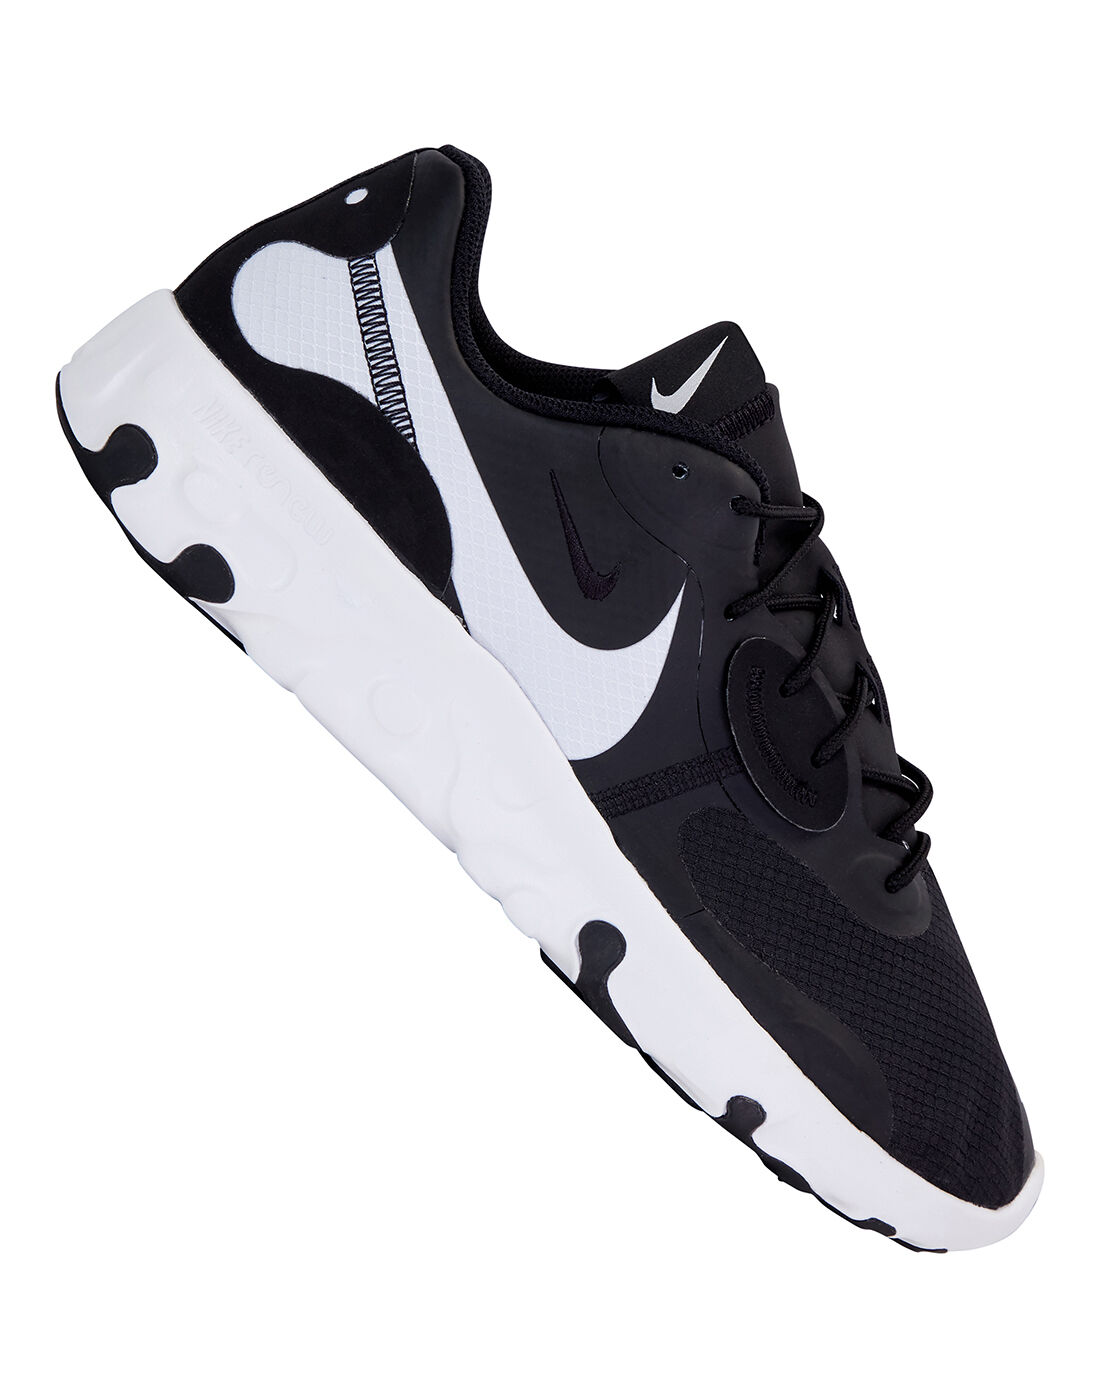 Nike evolution of nike huarache shoes black friday | Mens Renew Lucent